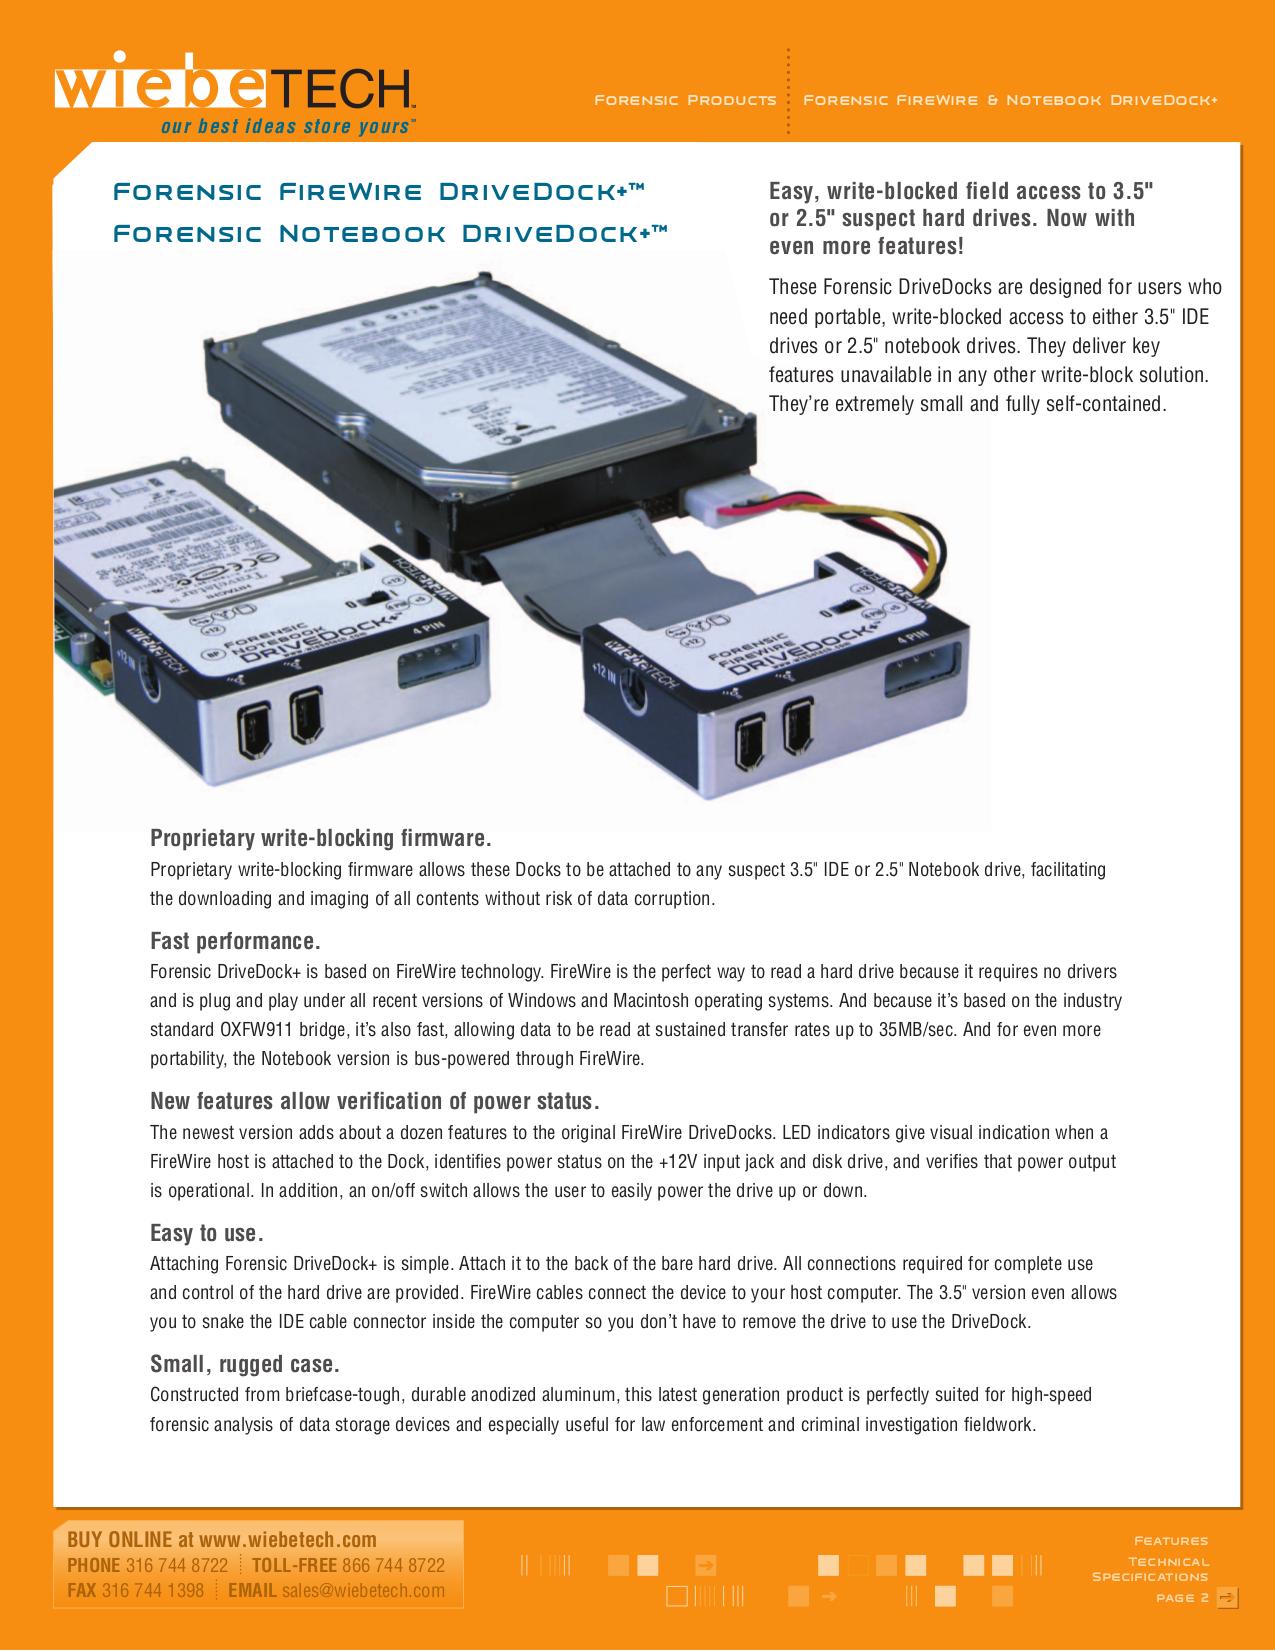 pdf for Wiebetech Storage FWDDP manual